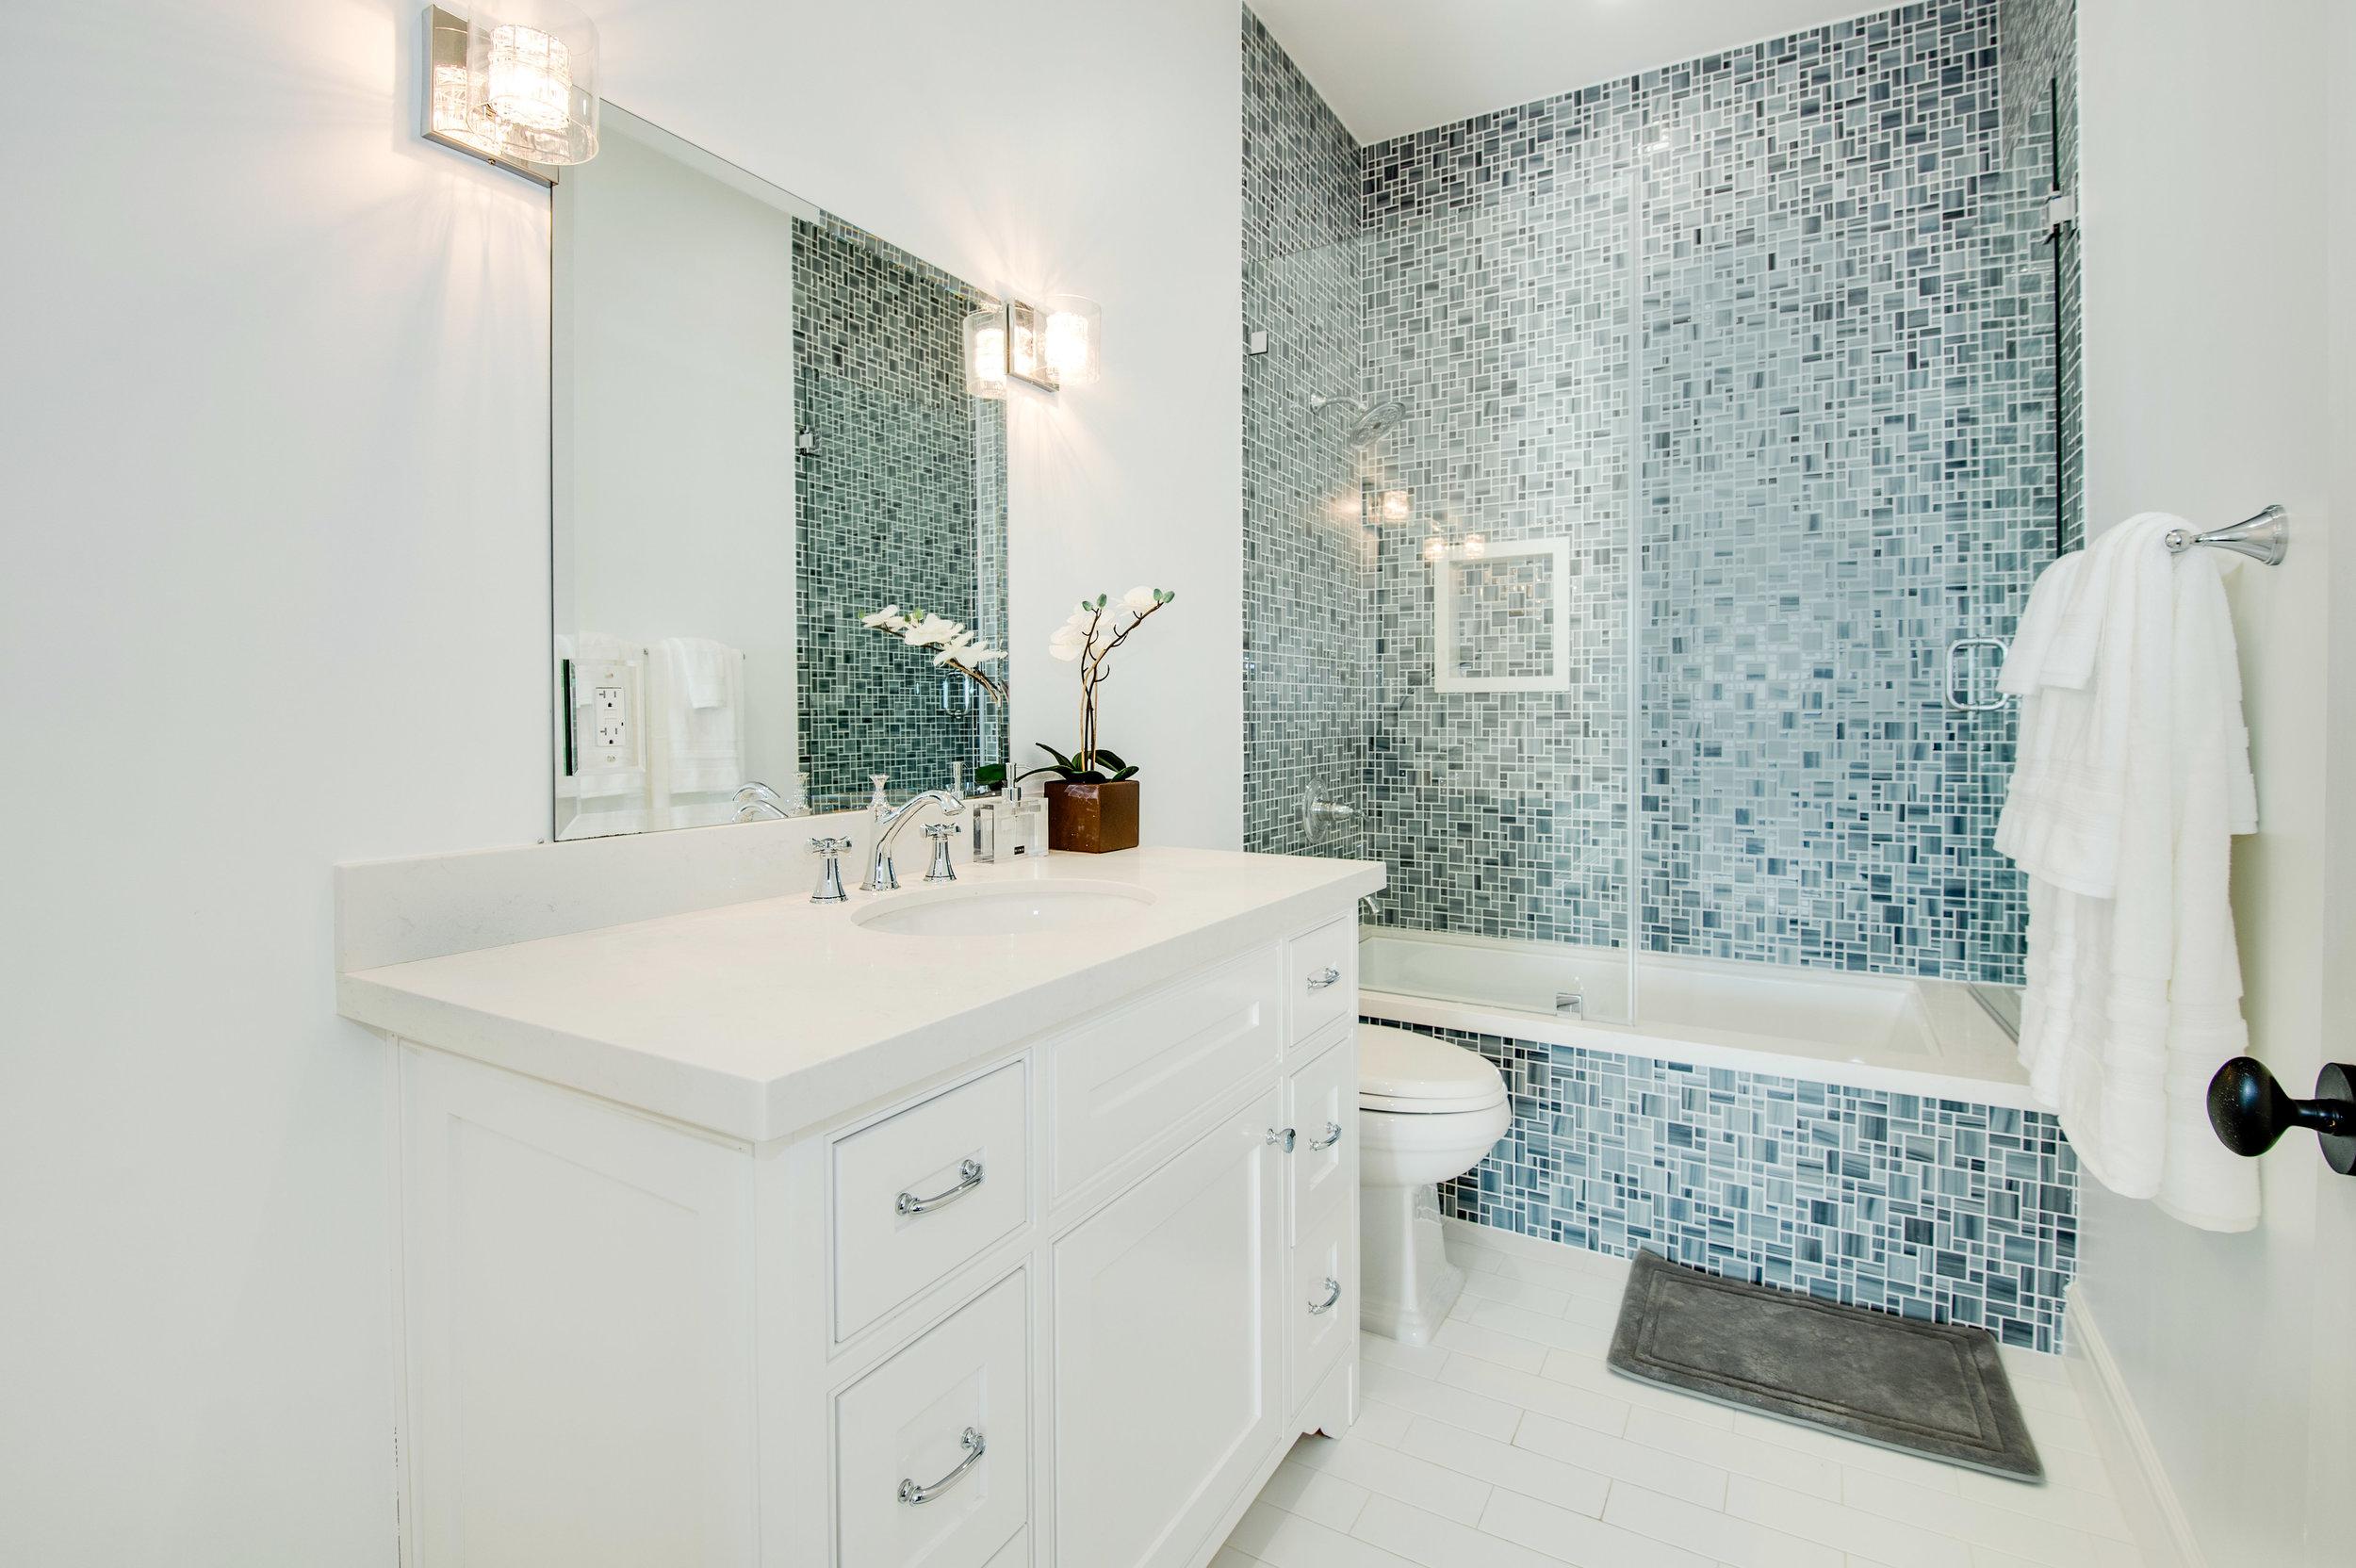 019 Bathroom 17819 Castellammare Drive Pacific Palisades For Sale Lease The Malibu Life Team Compass Luxury Real Estate.jpg